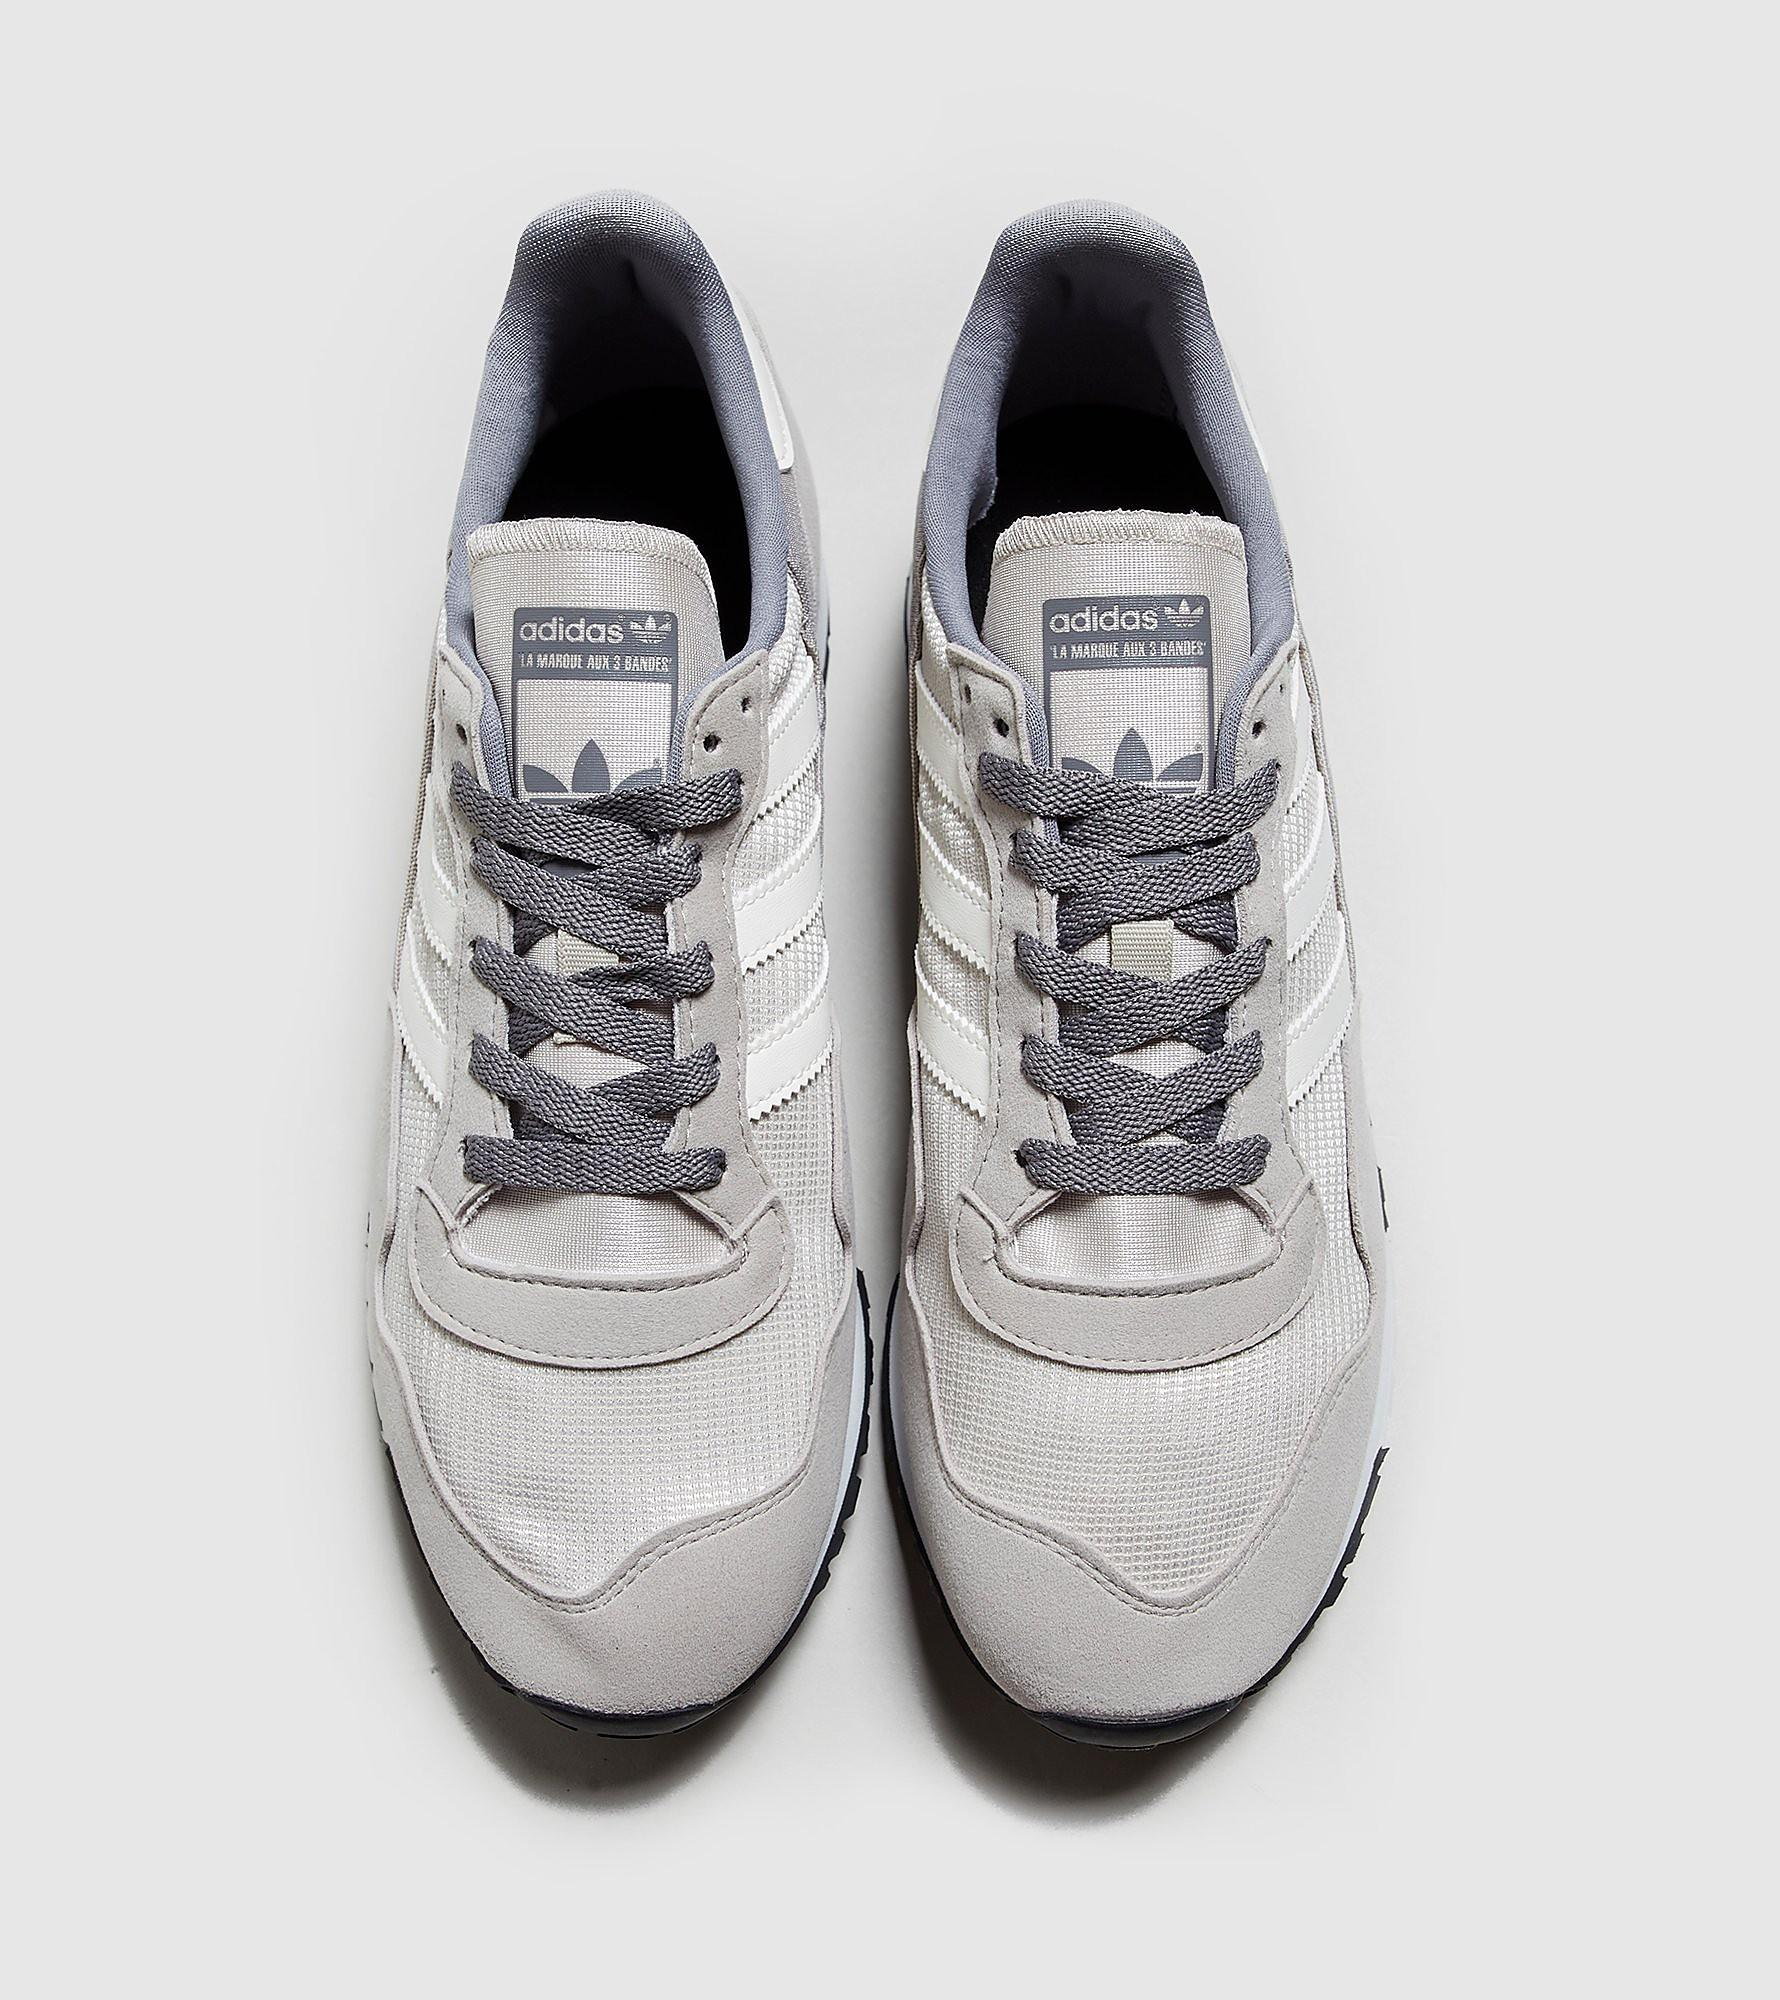 Lowertree adidas Originals de Tejido sintético de color Gris para hombre